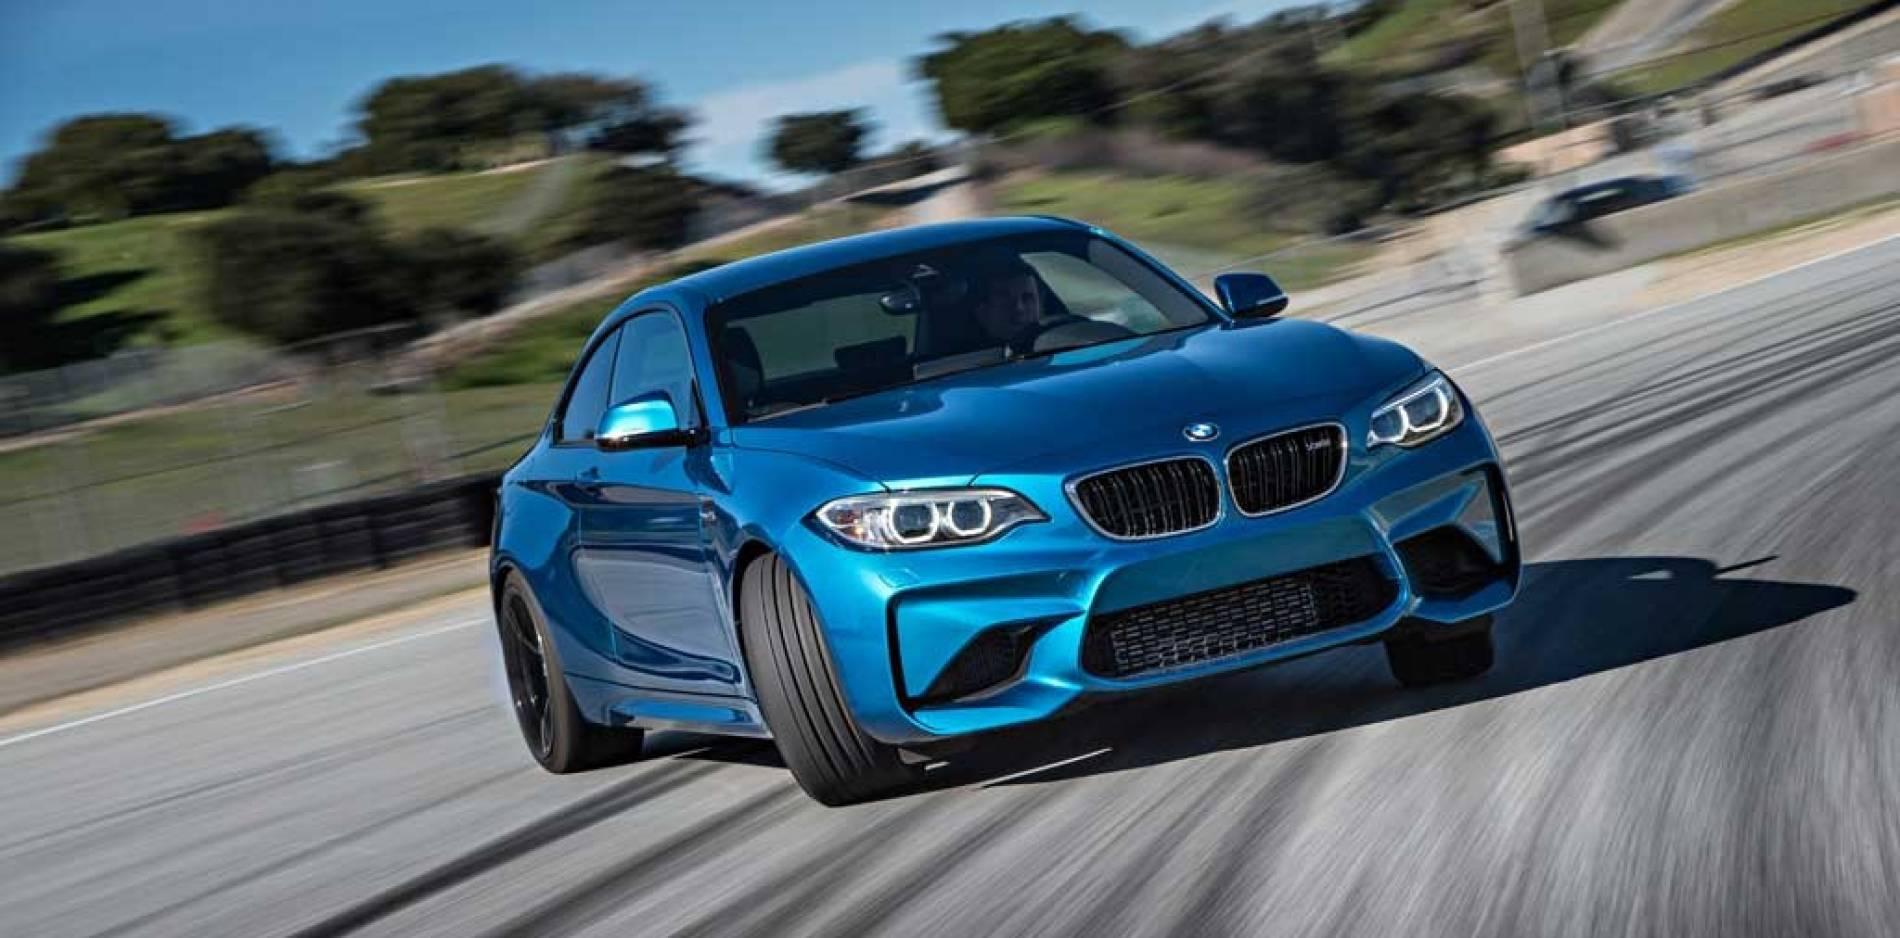 Prueba BMW M2 Coupé: ¡un cañón!